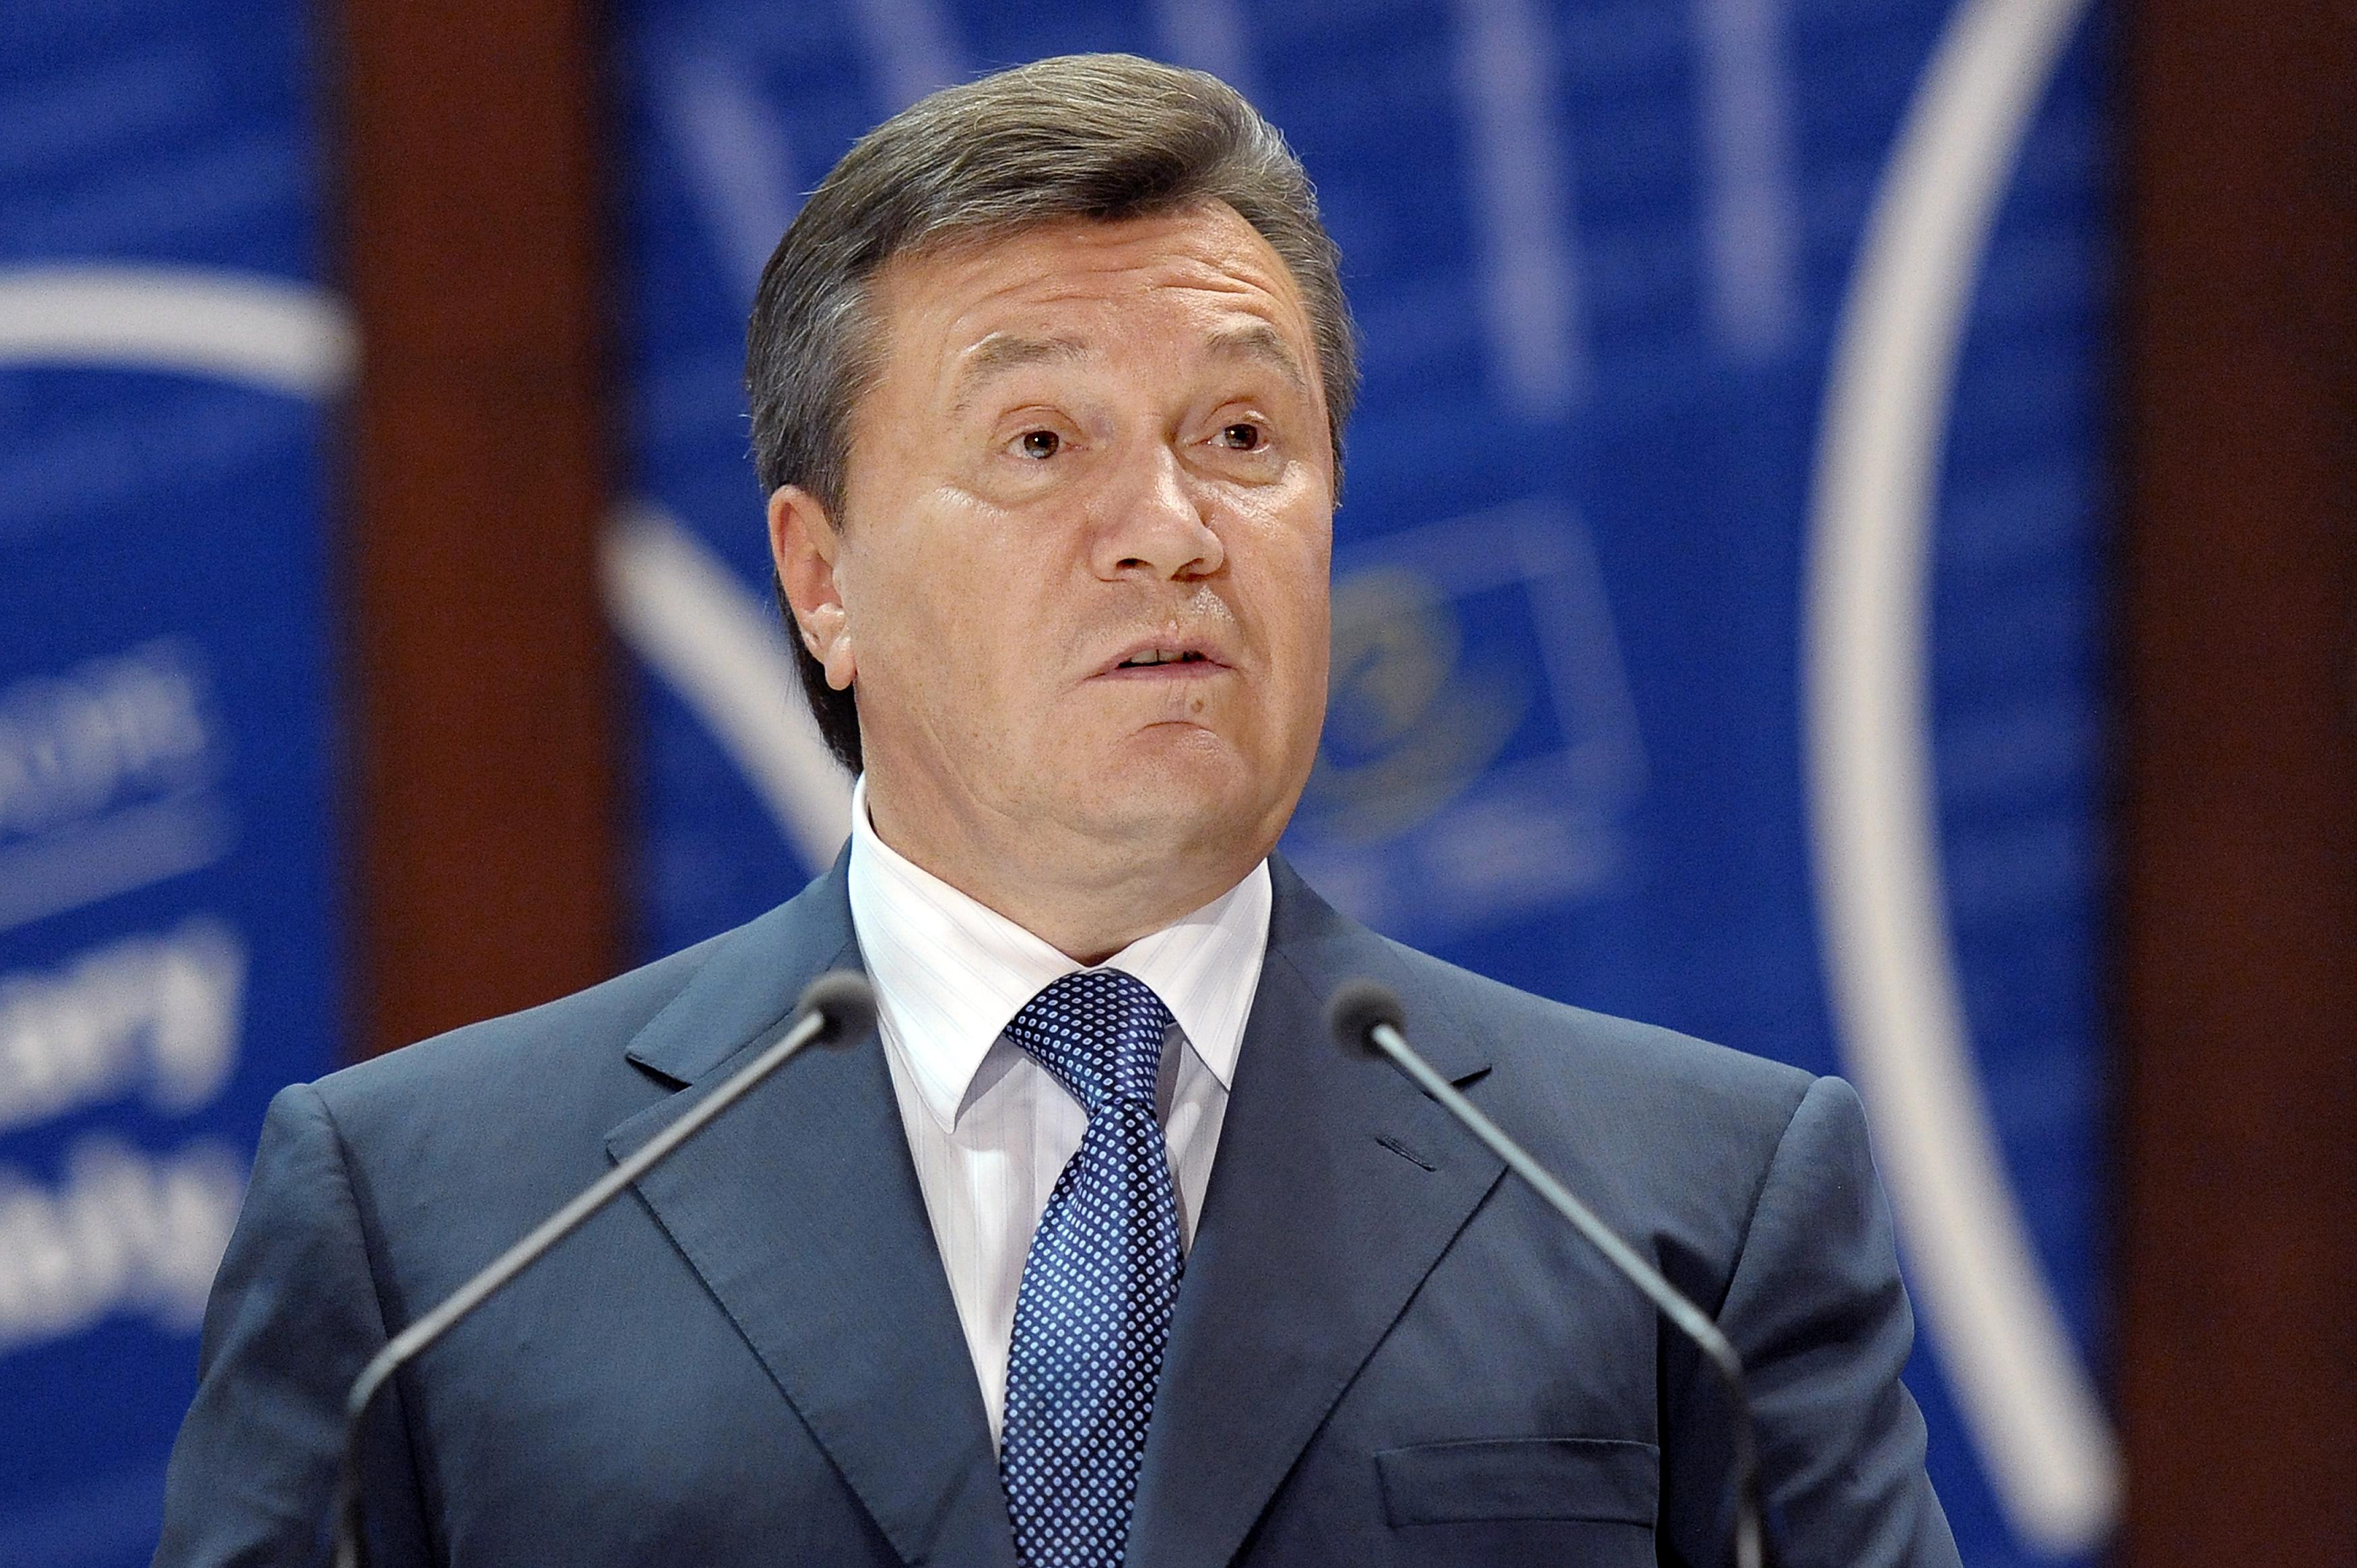 Янукович отказался от гражданства РФ